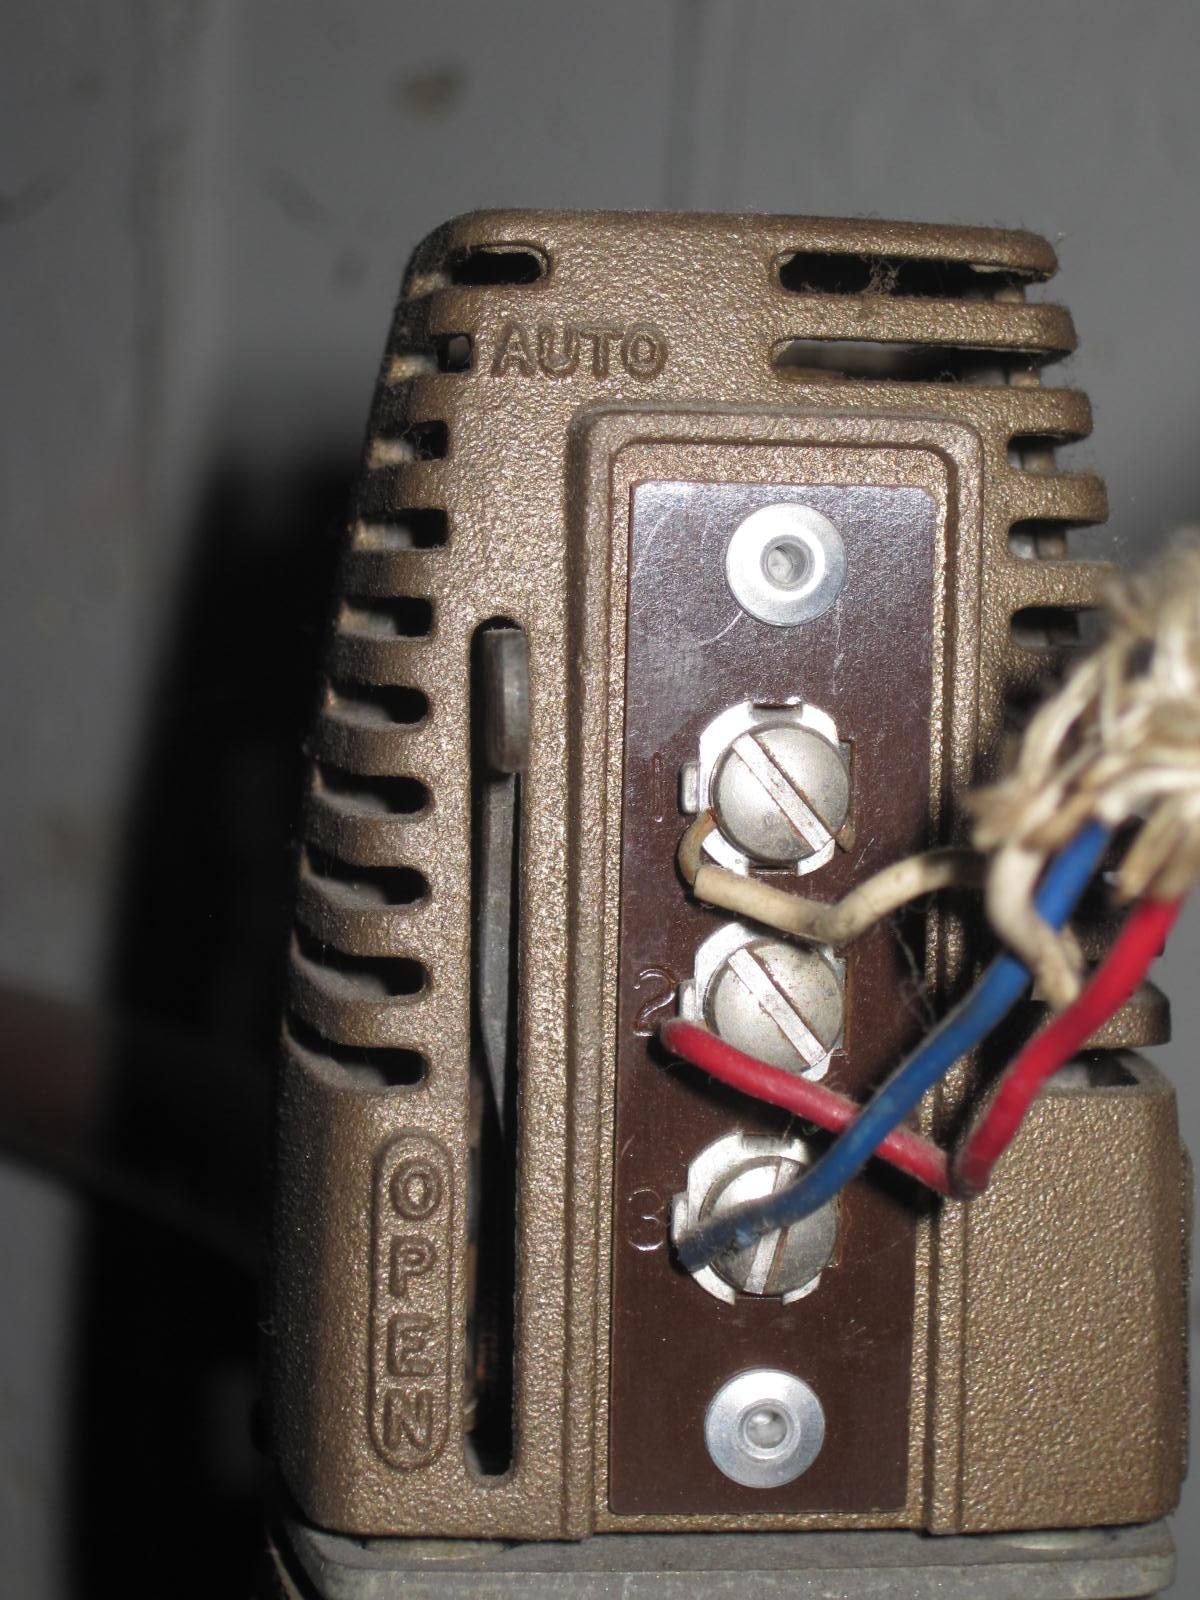 honeywell 24 volt transformer wiring diagram honda small engine carburetor aquastar l8048g 43 2 taco zone valves adding